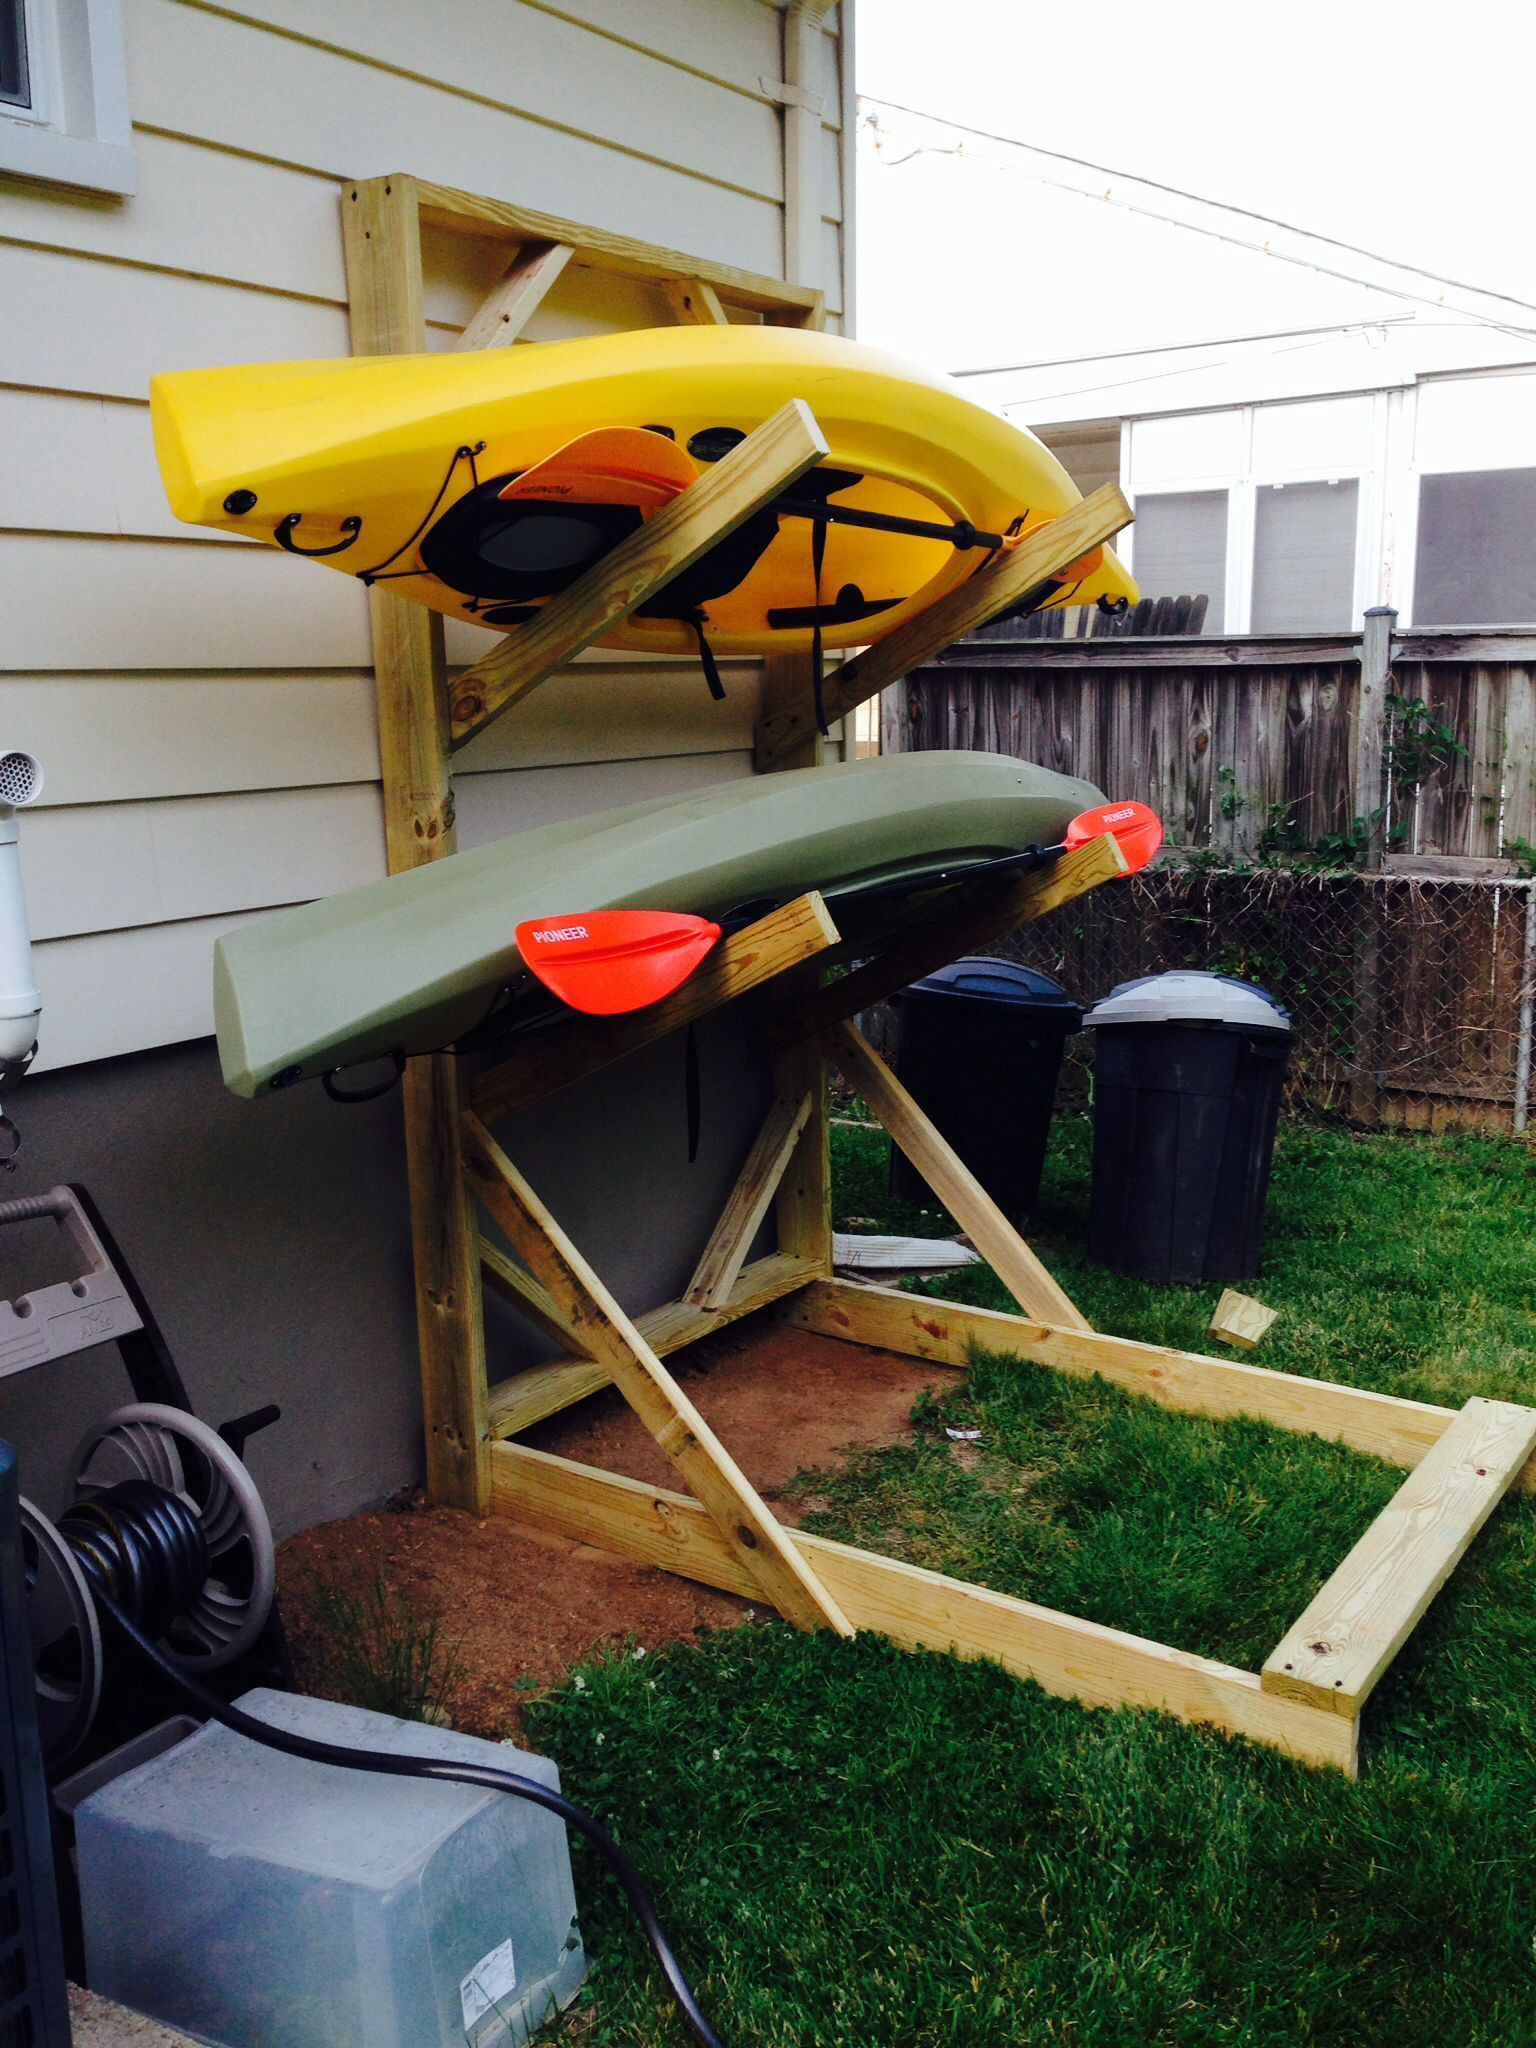 Best ideas about Kayak Storage Rack DIY . Save or Pin plete Diy outdoor canoe storage rack J Bome Now.